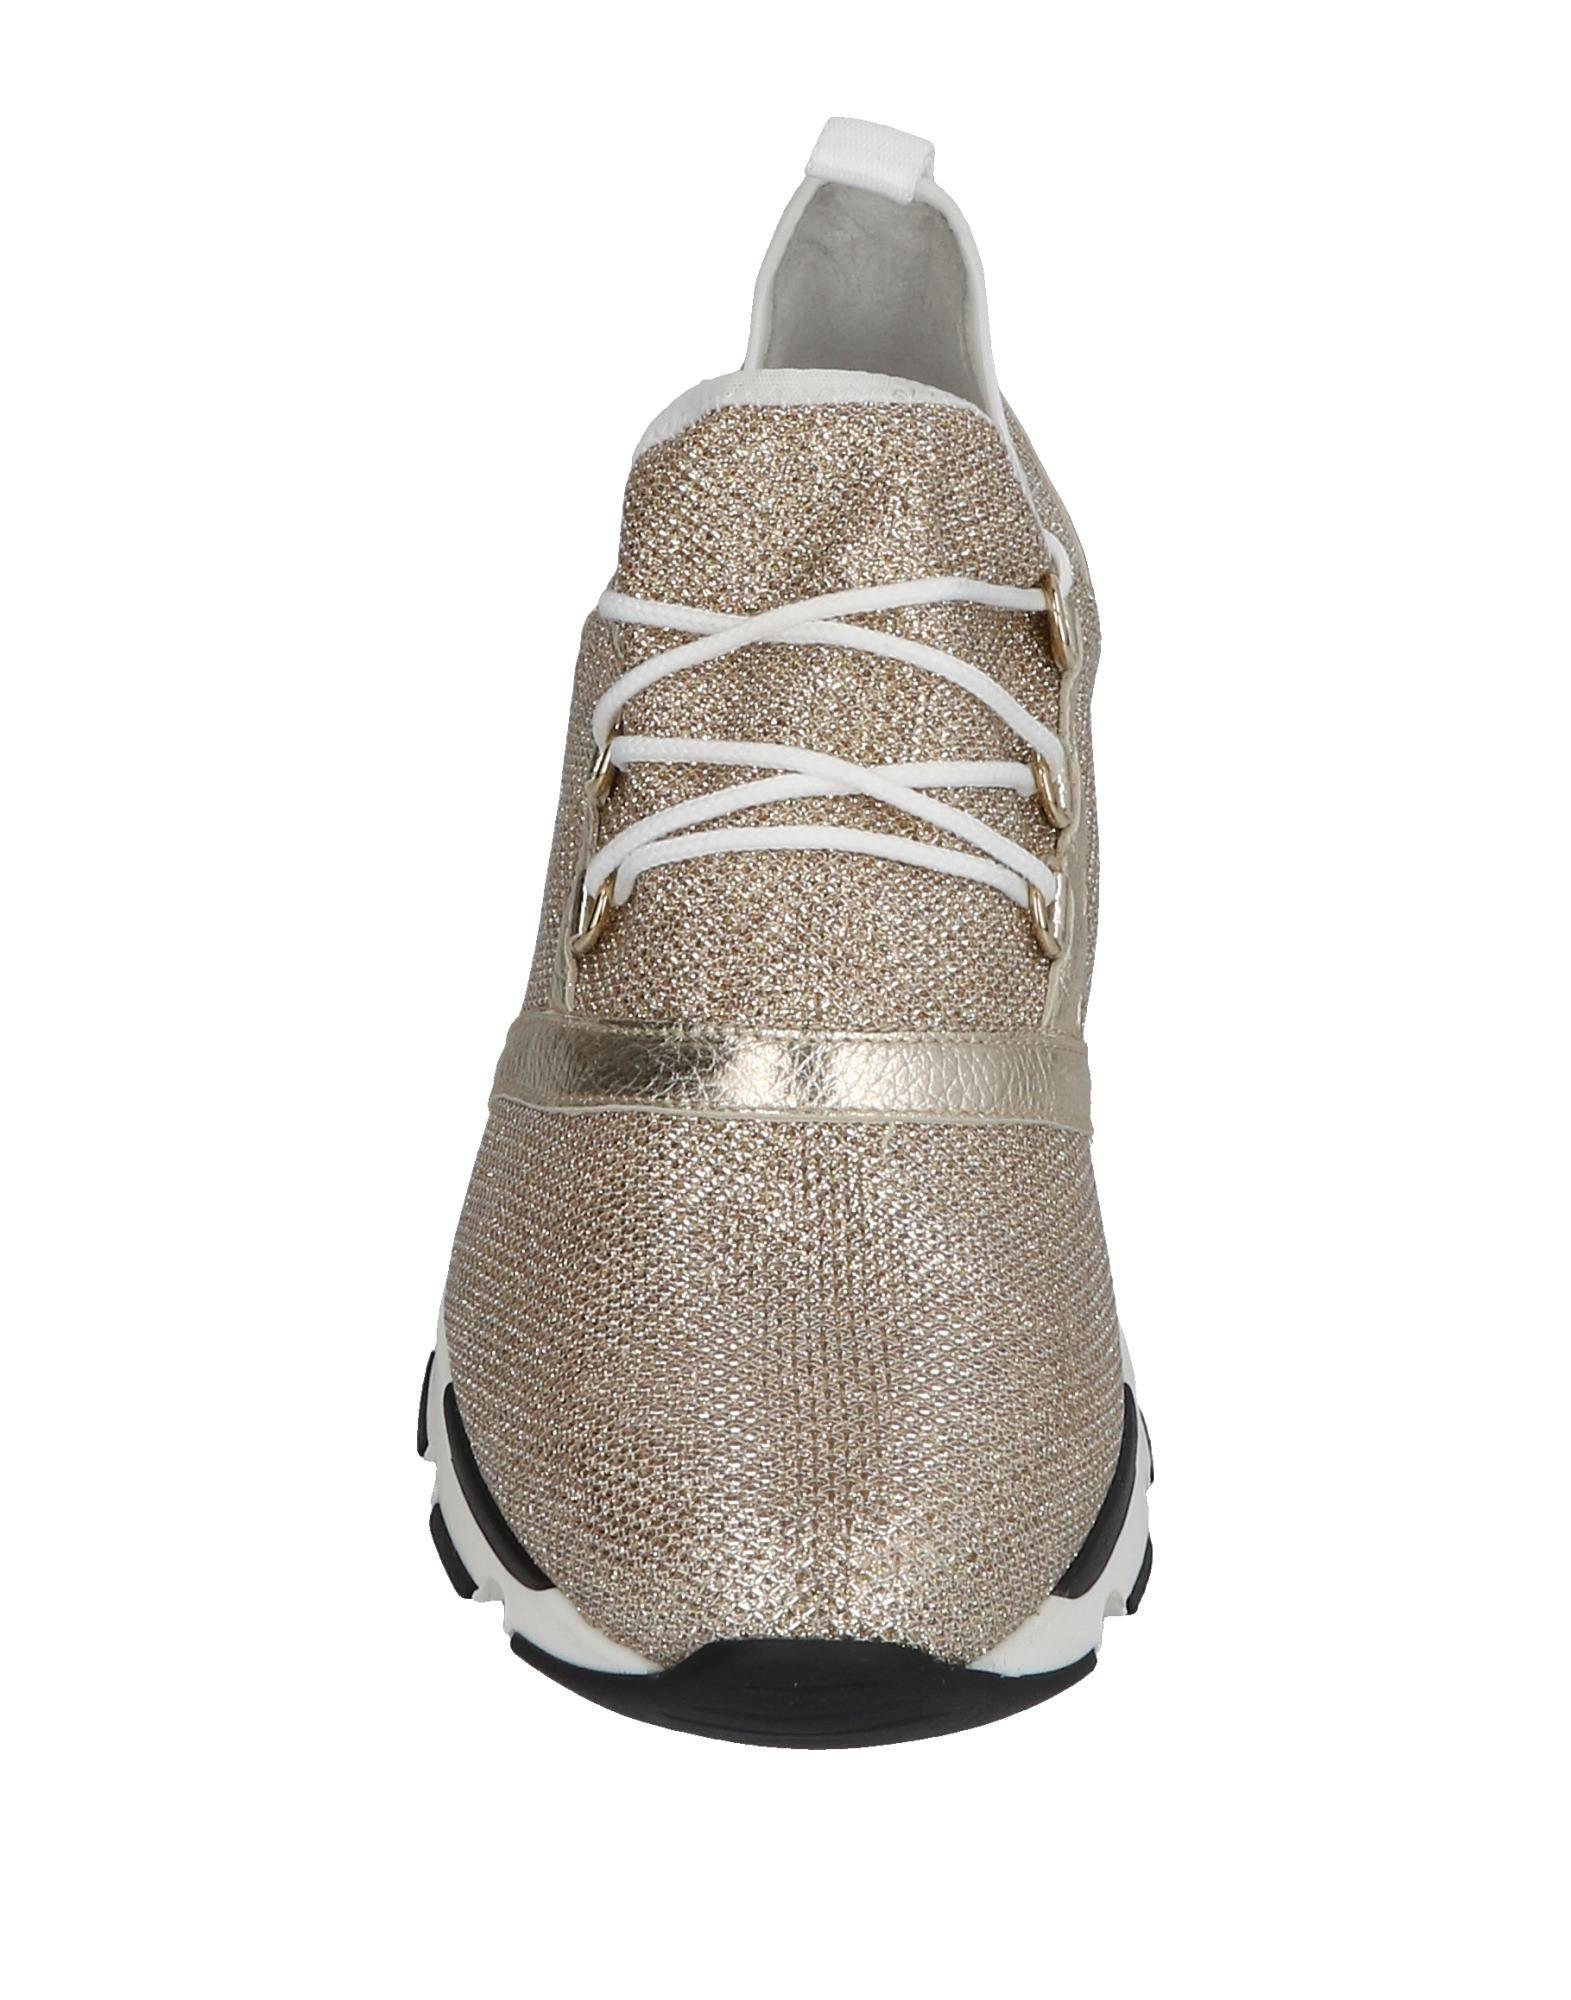 Carla G. Sneakers Damen  11418943EE Neue Neue 11418943EE Schuhe e5bec8